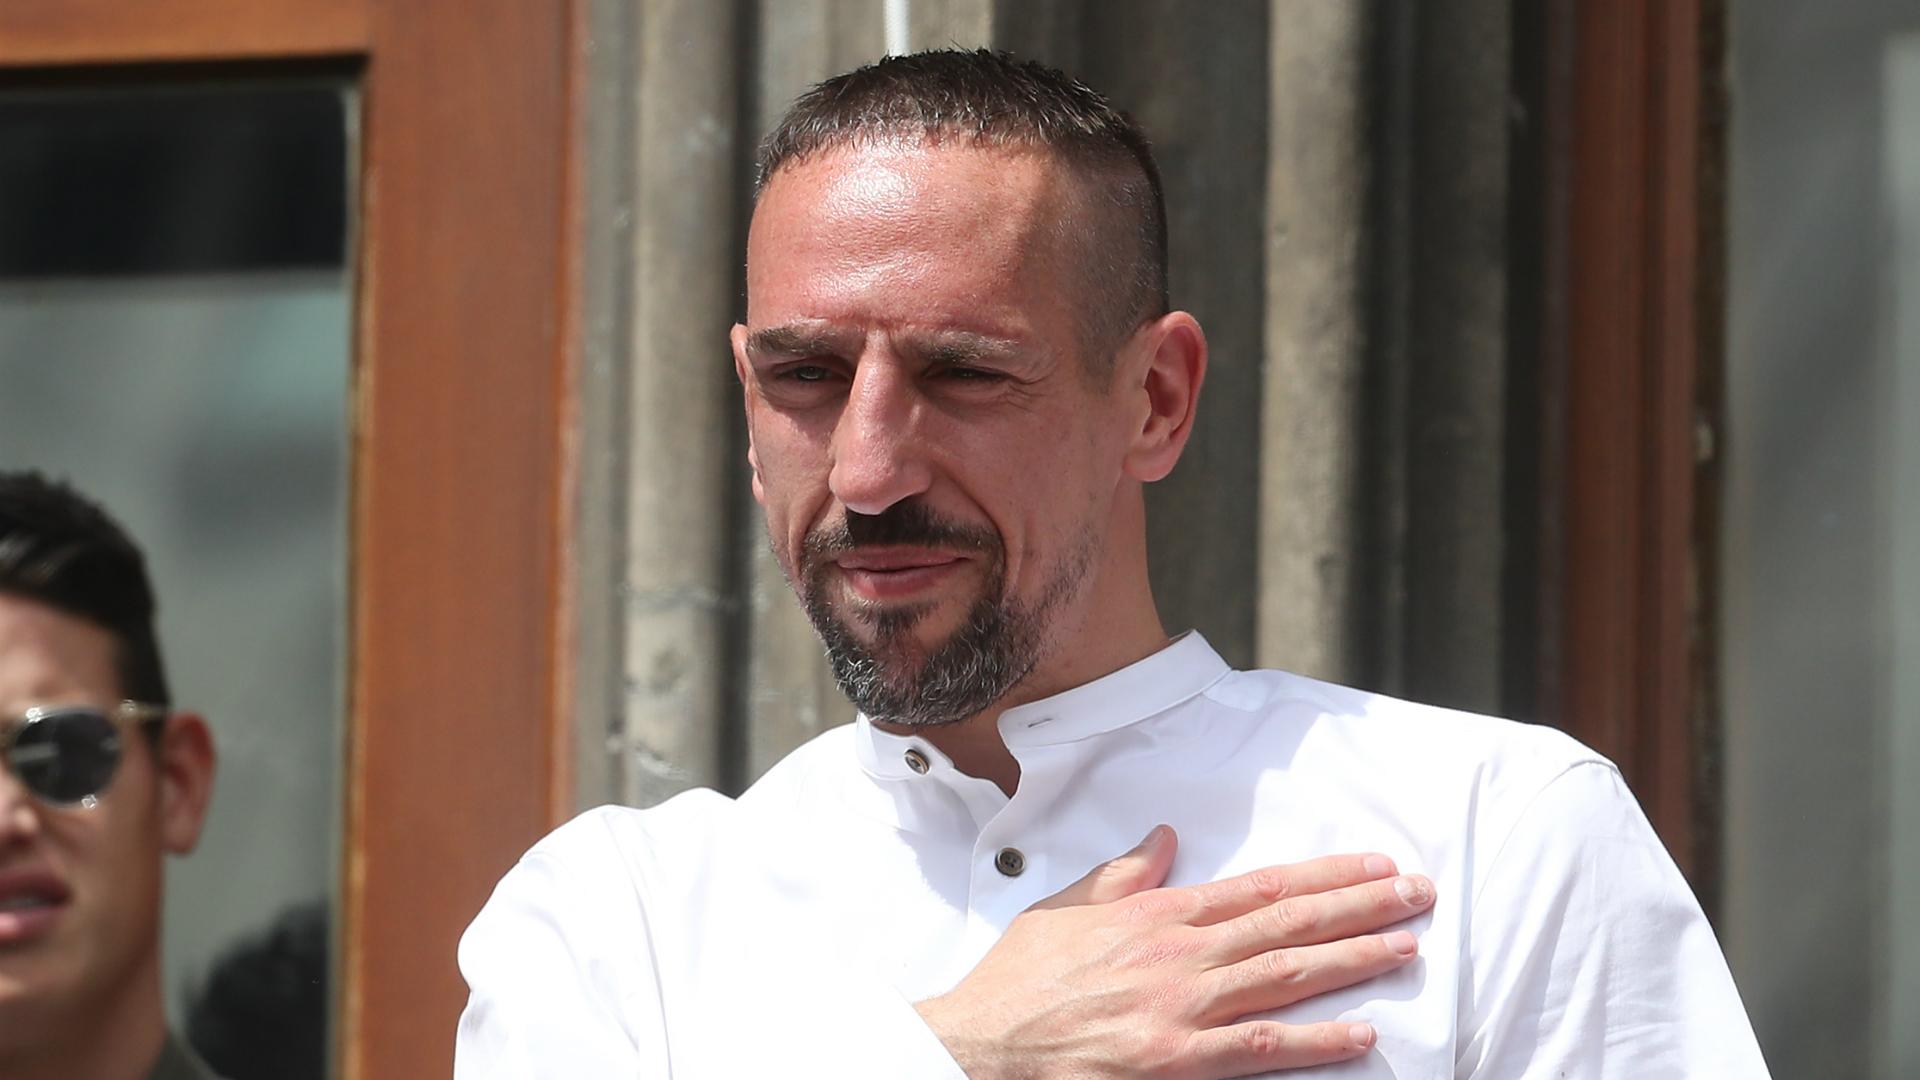 Ribery could make Fiorentina debut against Napoli - Montella